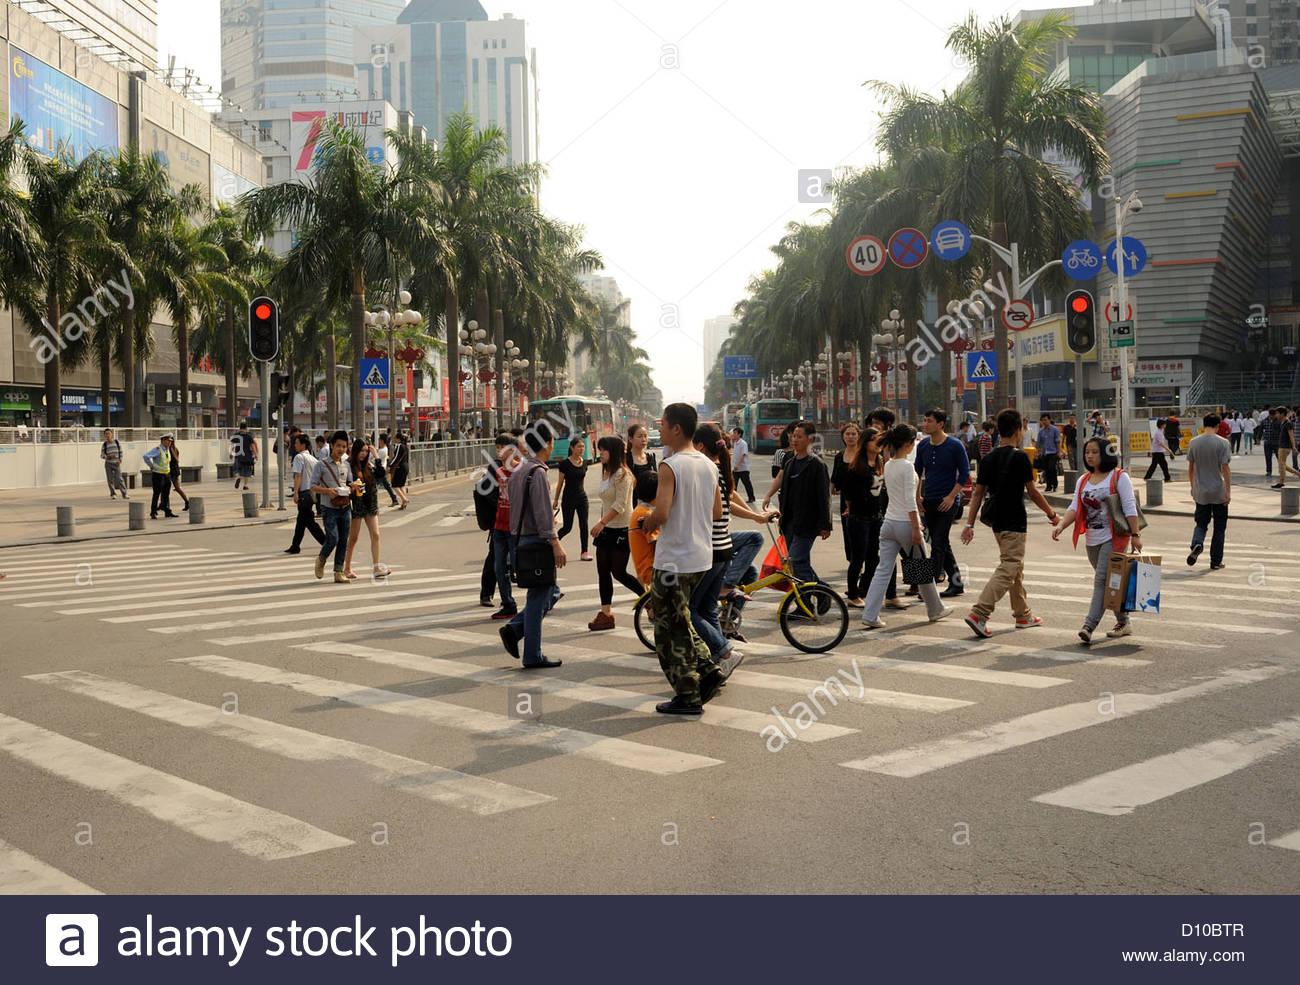 Shenzhen, China Zebra crossing diagonal across the road. - Stock Image